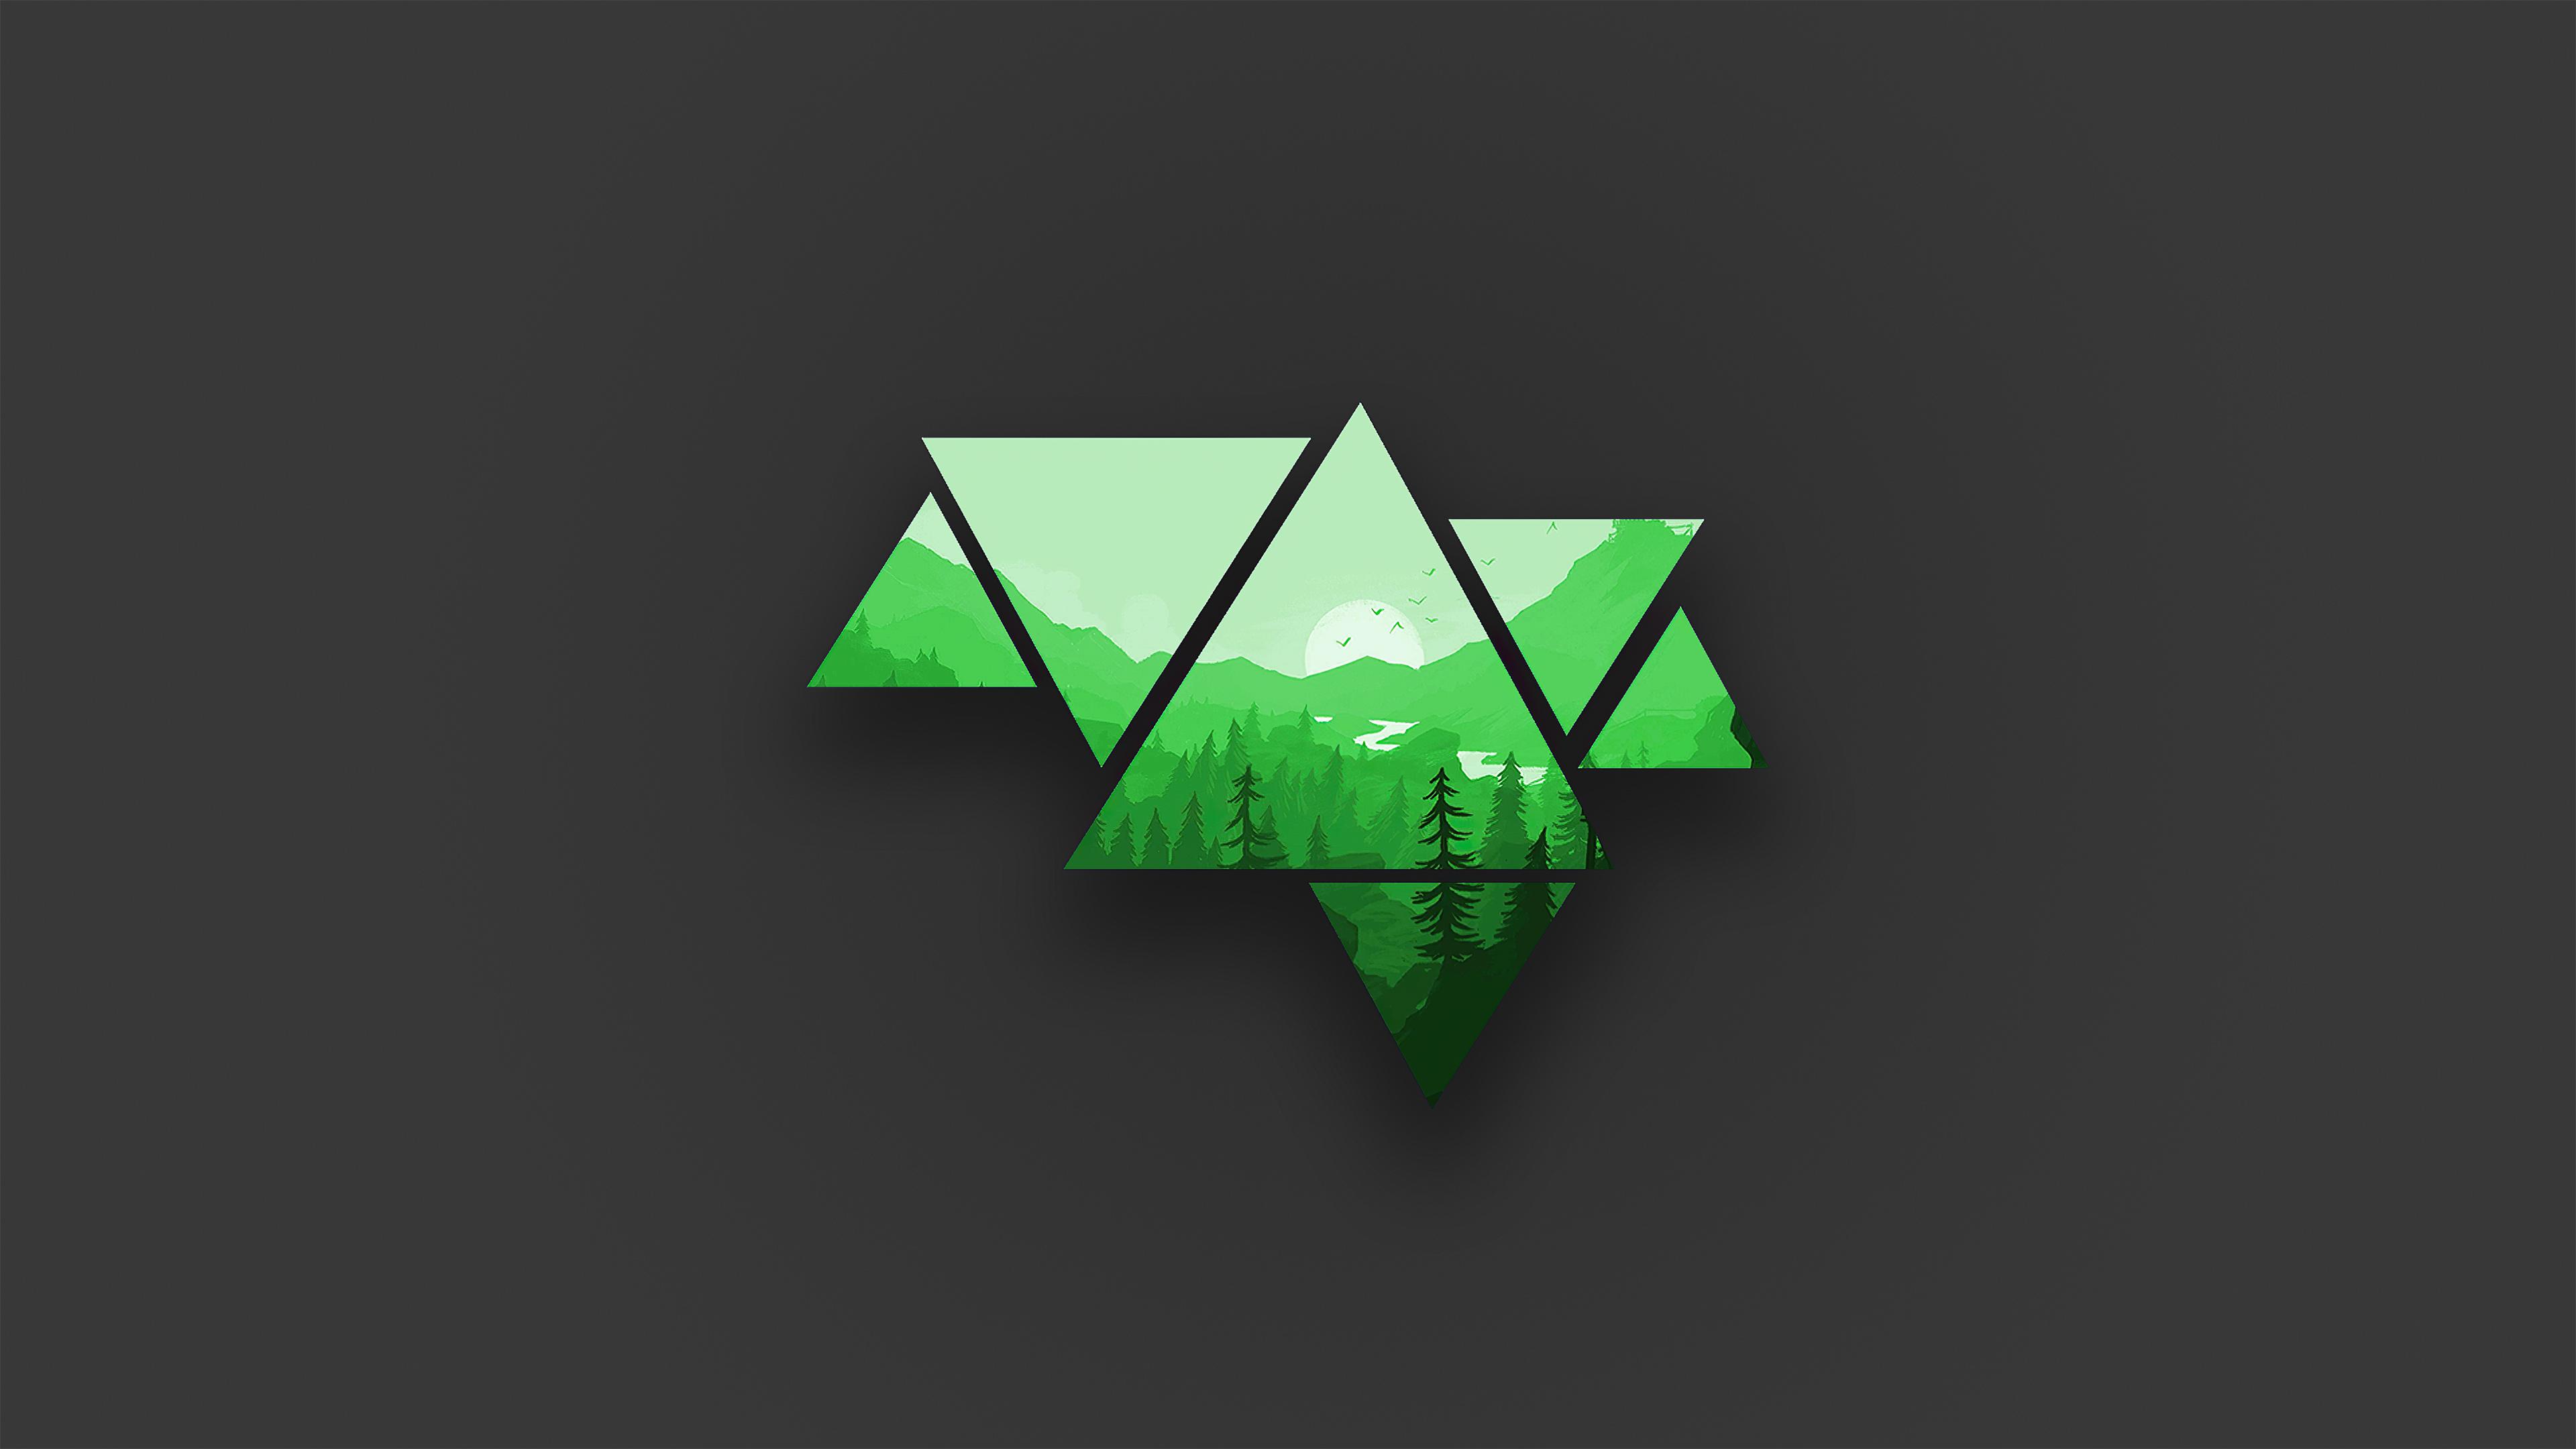 Minimalist Mountains Green 4k, HD Artist, 4k Wallpapers ...